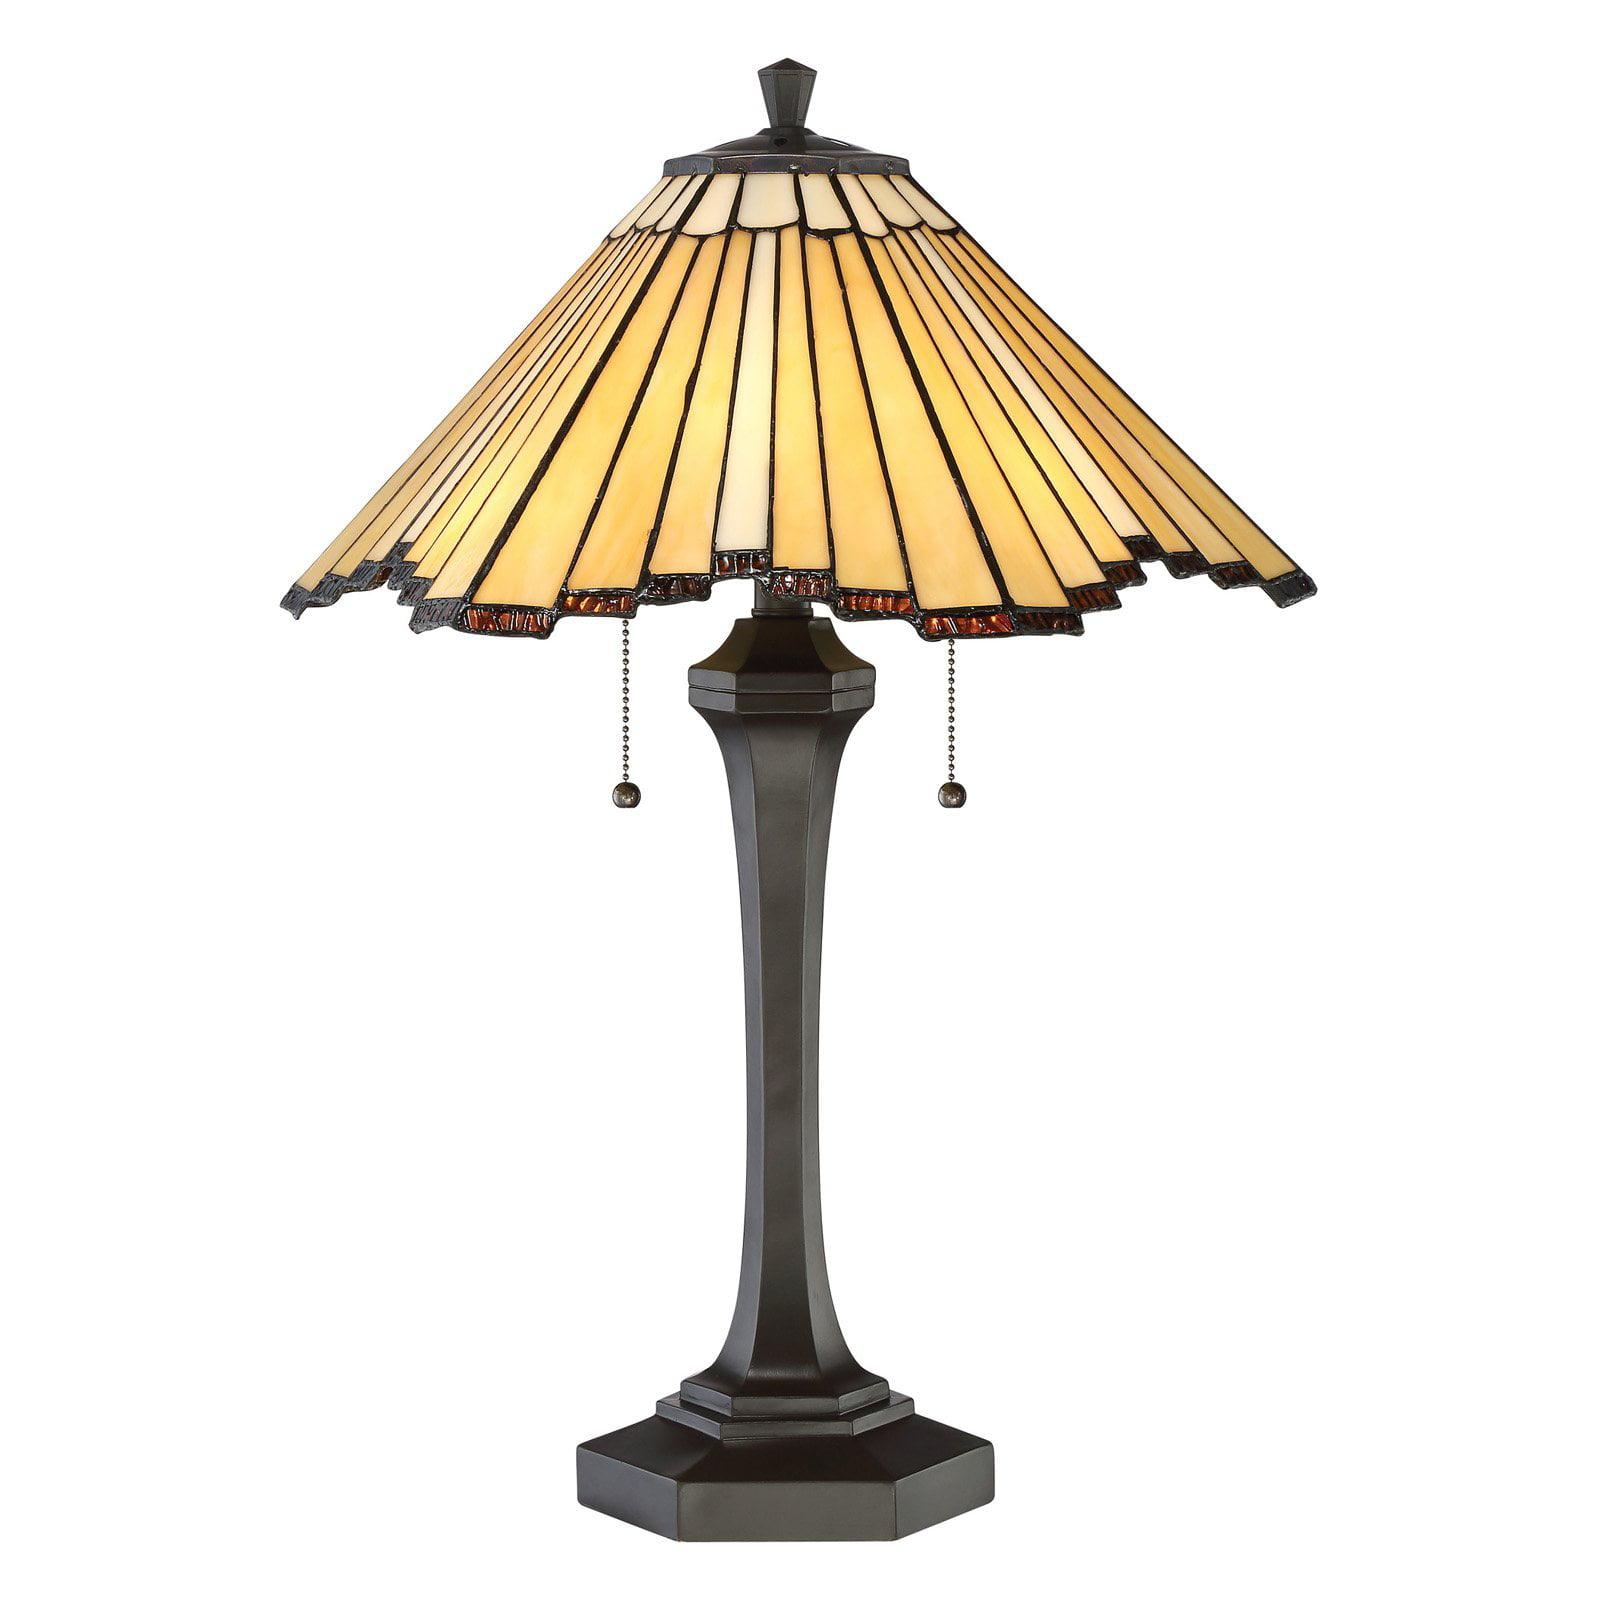 Quoizel Sunrays Table Lamp